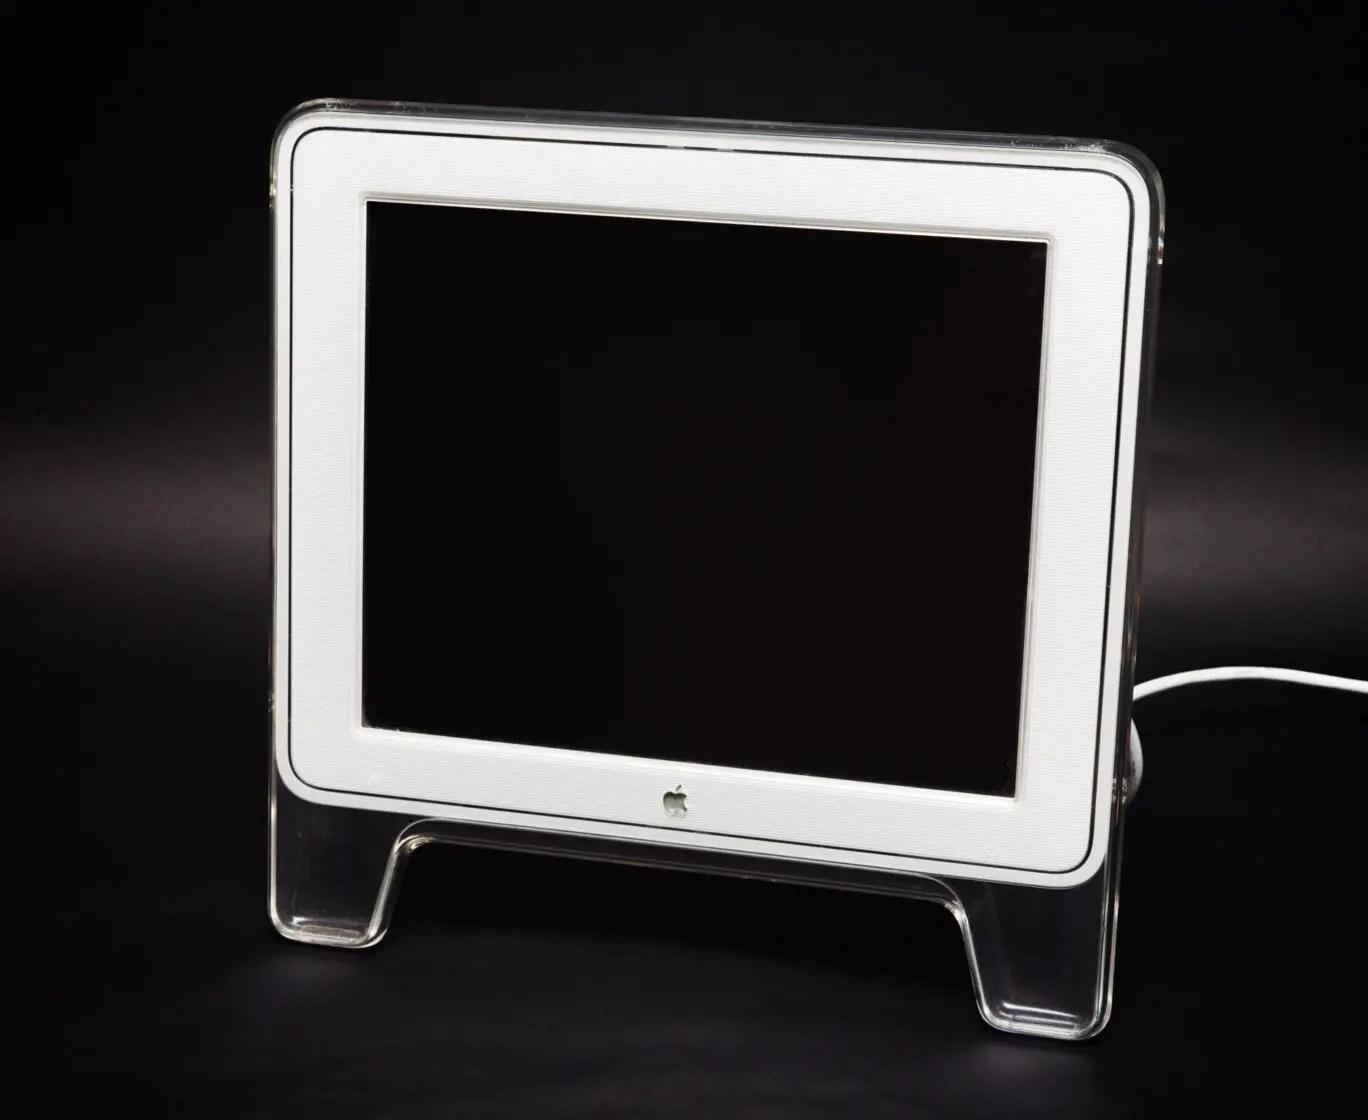 Apple Studio 15-inch LCD/ADC Display